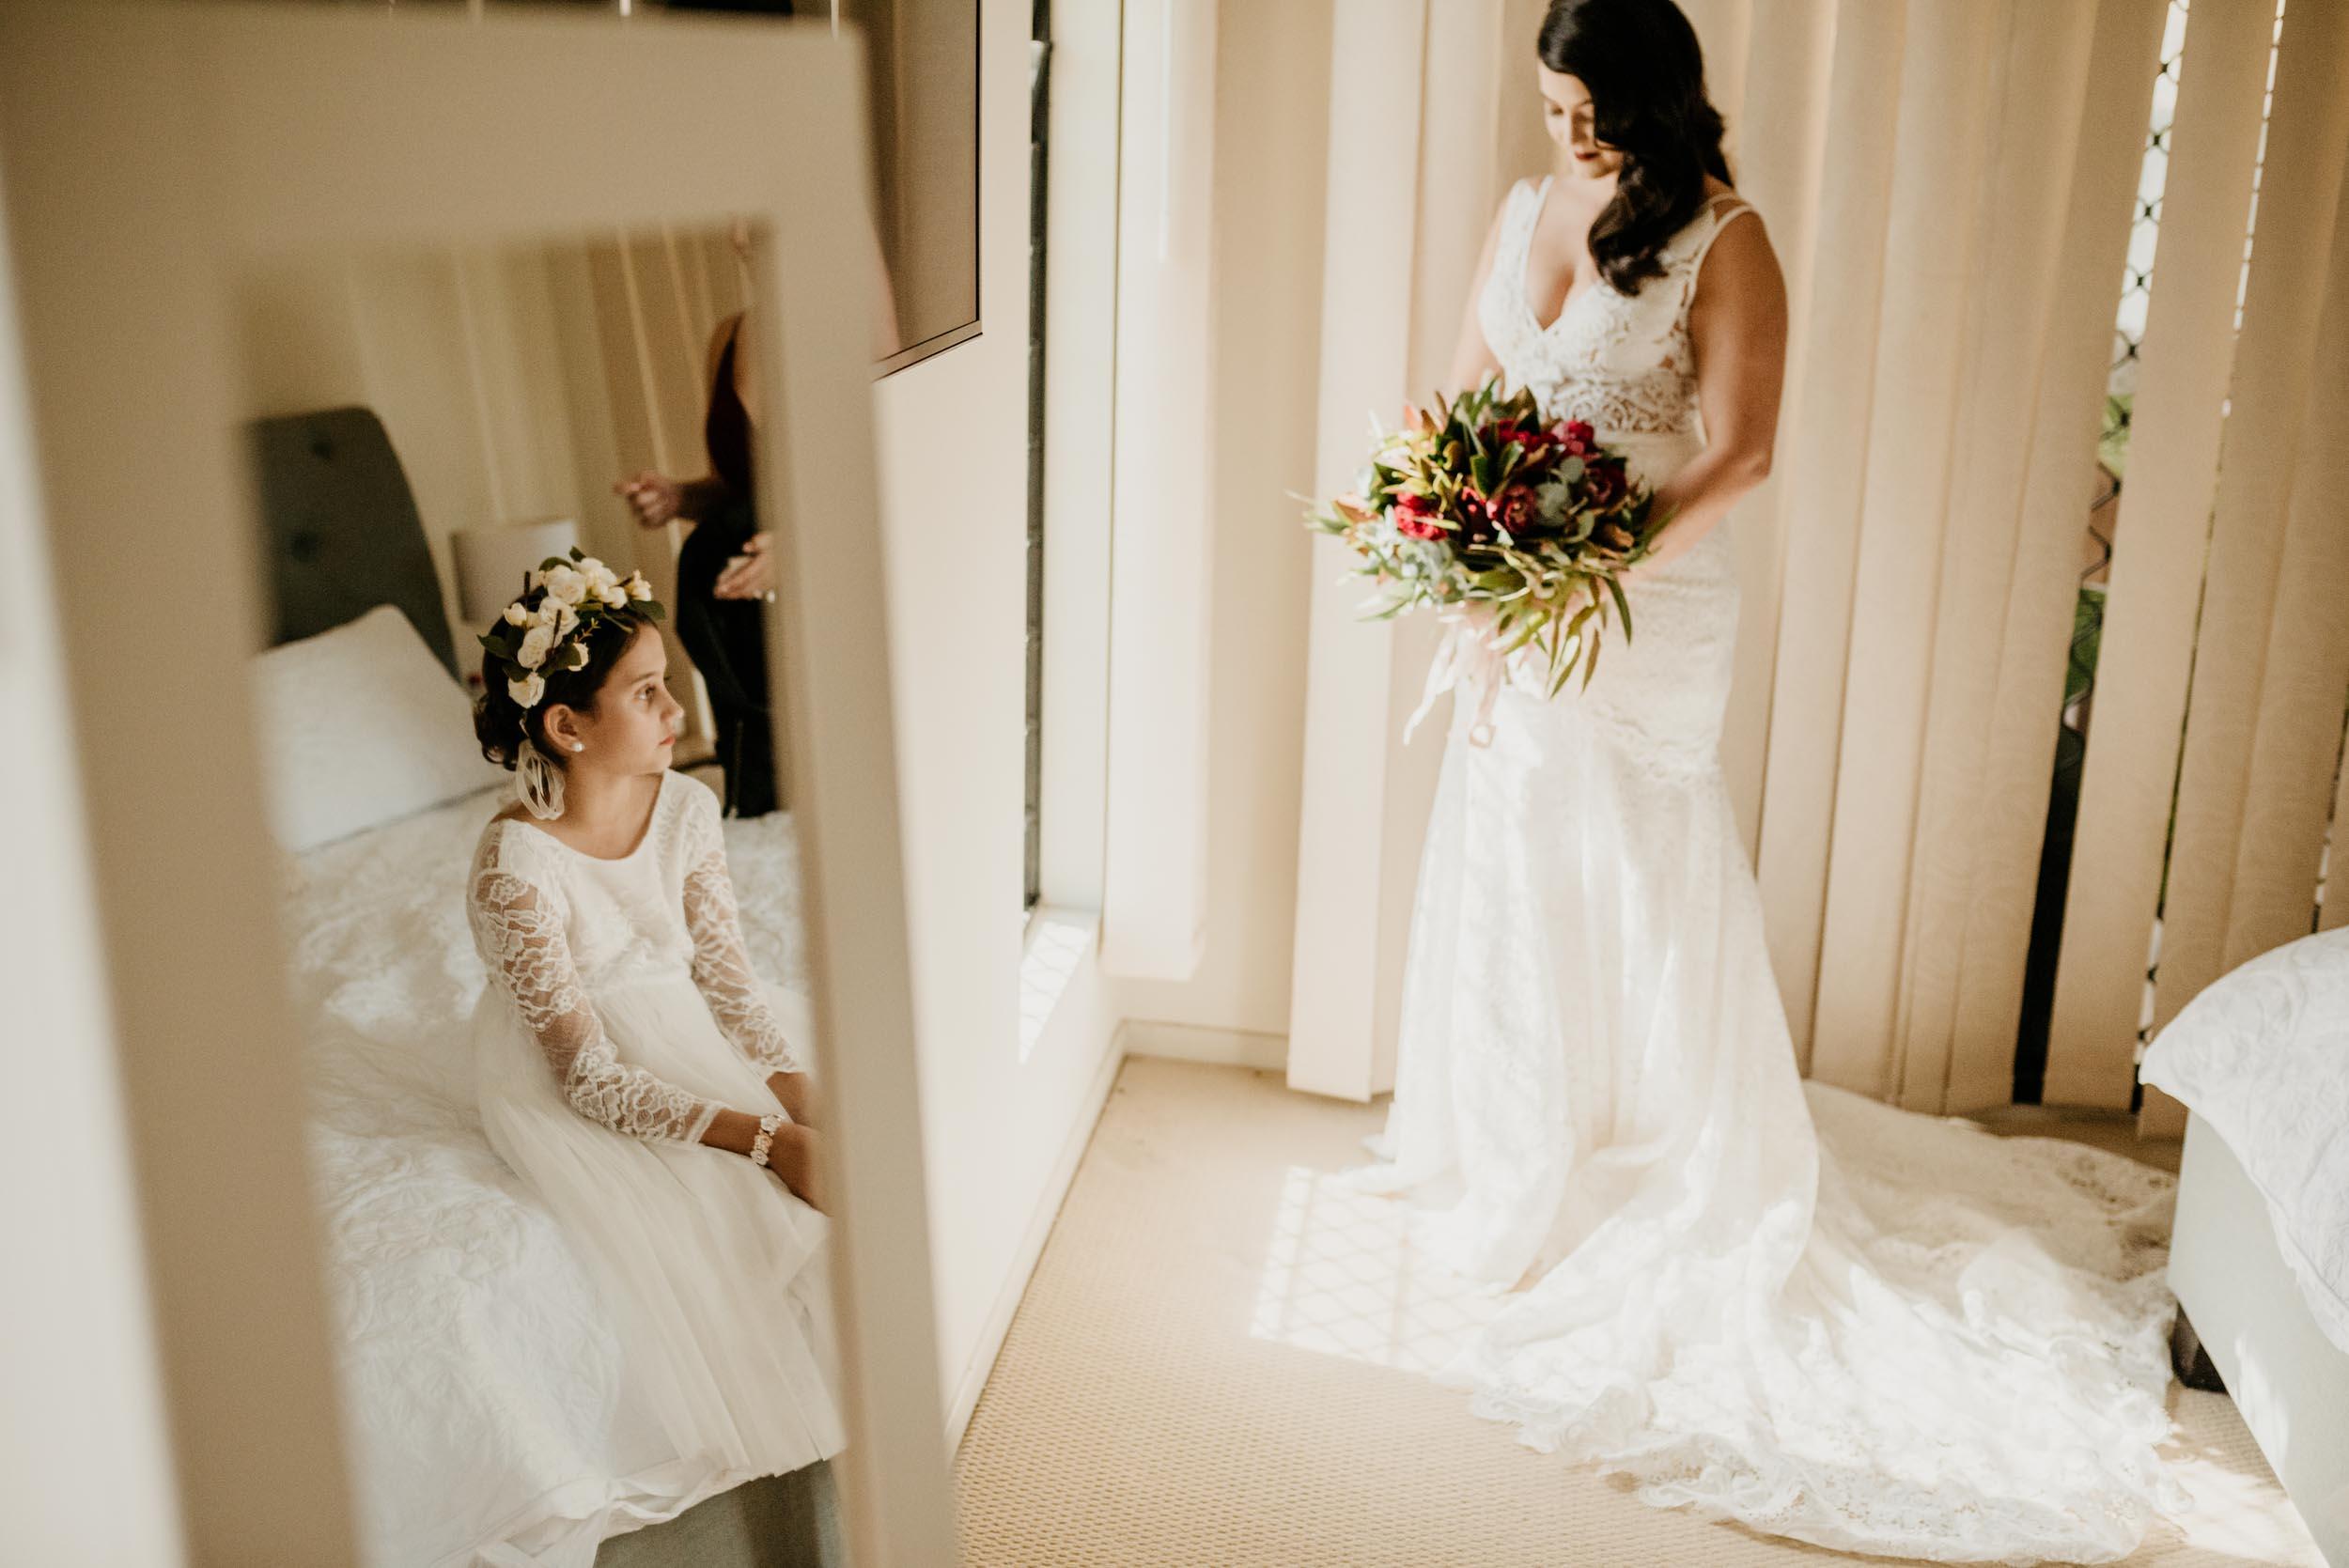 The Raw Photographer - Cairns Wedding Photographer - Atherton Tablelands - Mareeba farm Wedding - Irene Costa's Devine Bridal - Candid - Photo Package-16.jpg